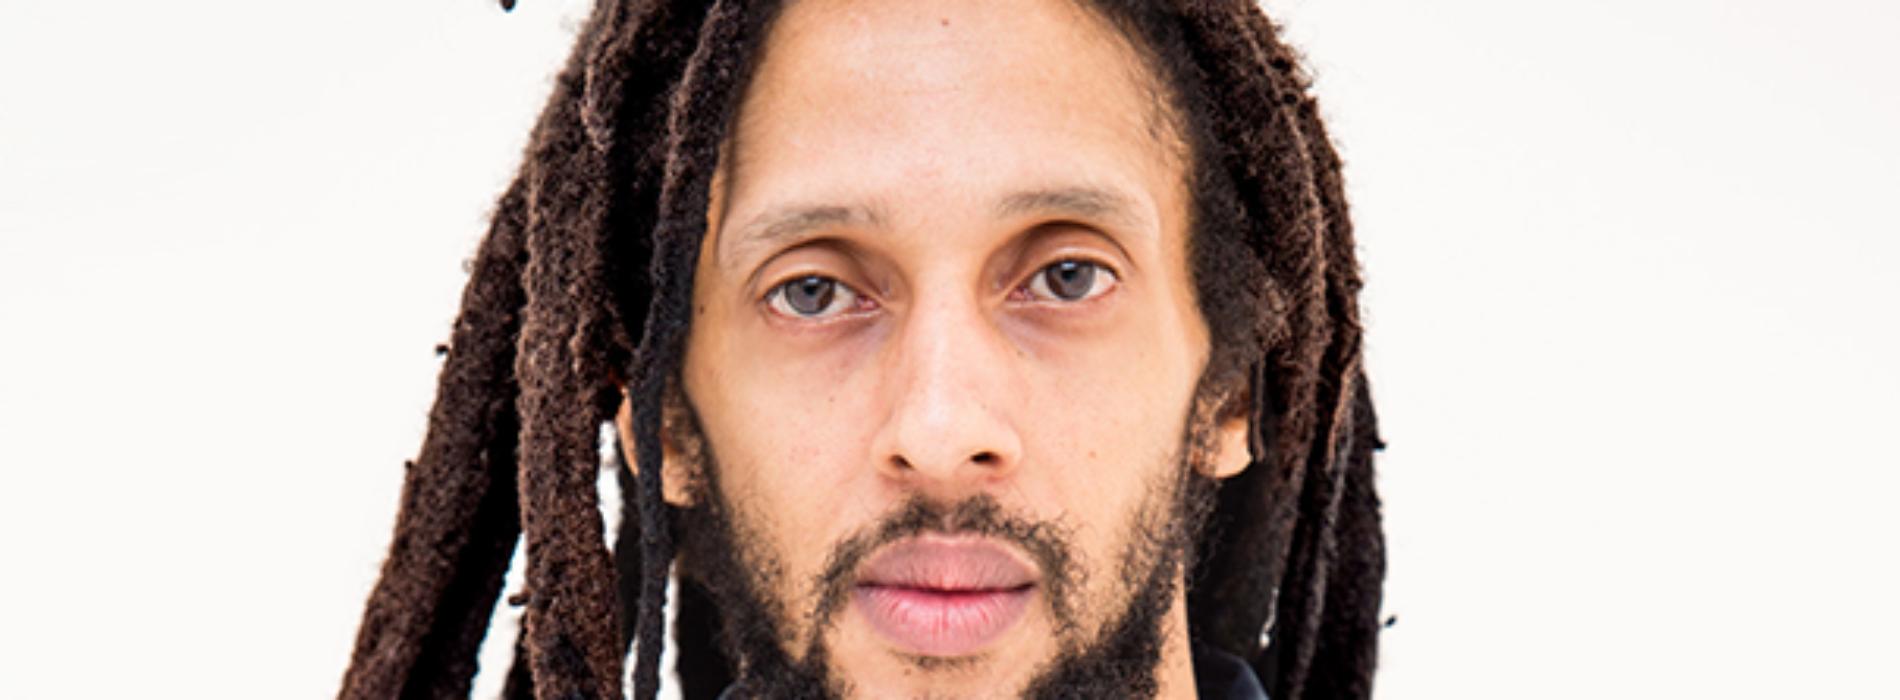 Julian Marley – Cooling in Jamaica (Official Video) – Août 2019